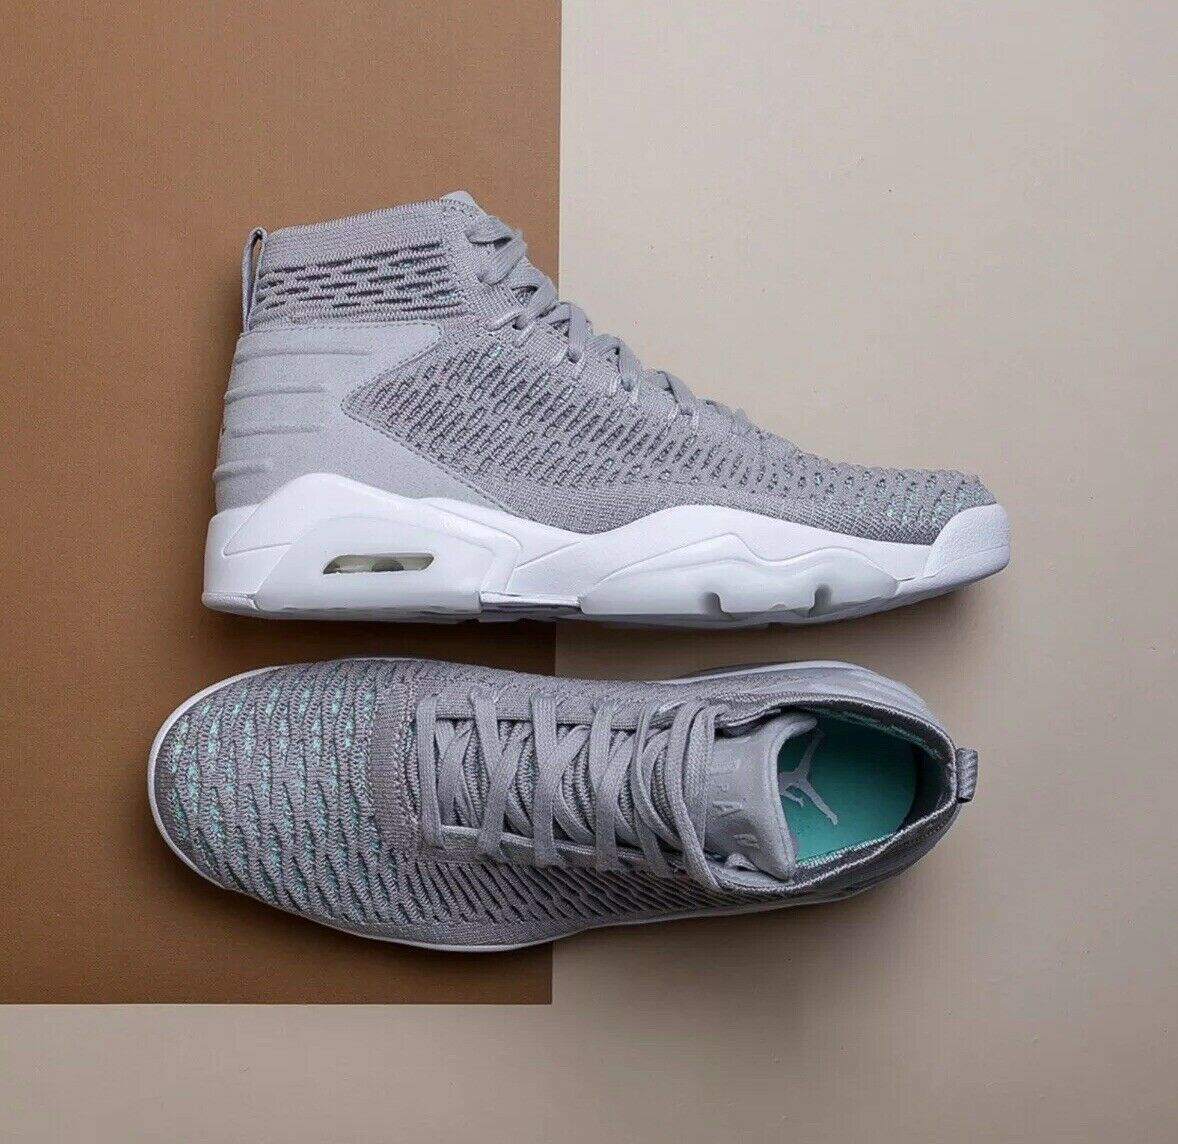 Nike Jordan Flyknit Elevation 23 Atmosphere Grey Men Basketball shoes AJ8207-004